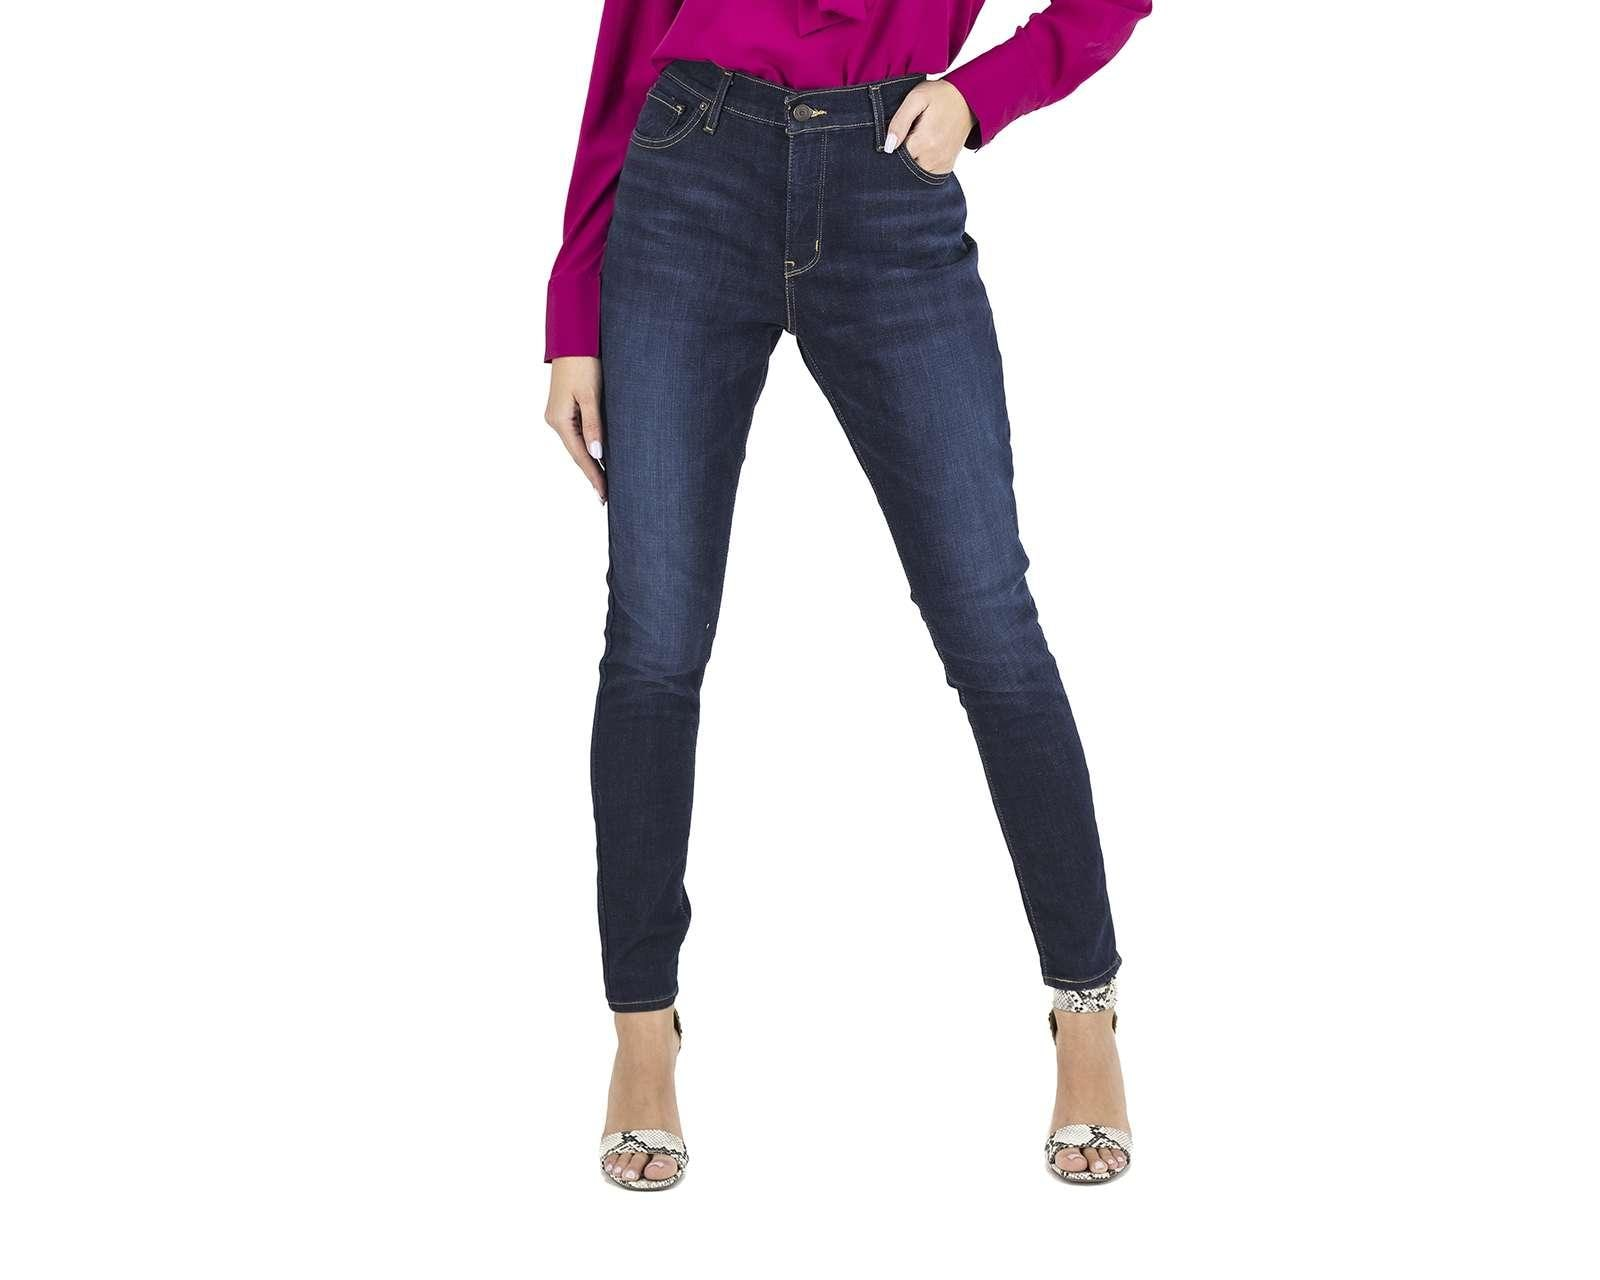 Jeans Levi's Skinny